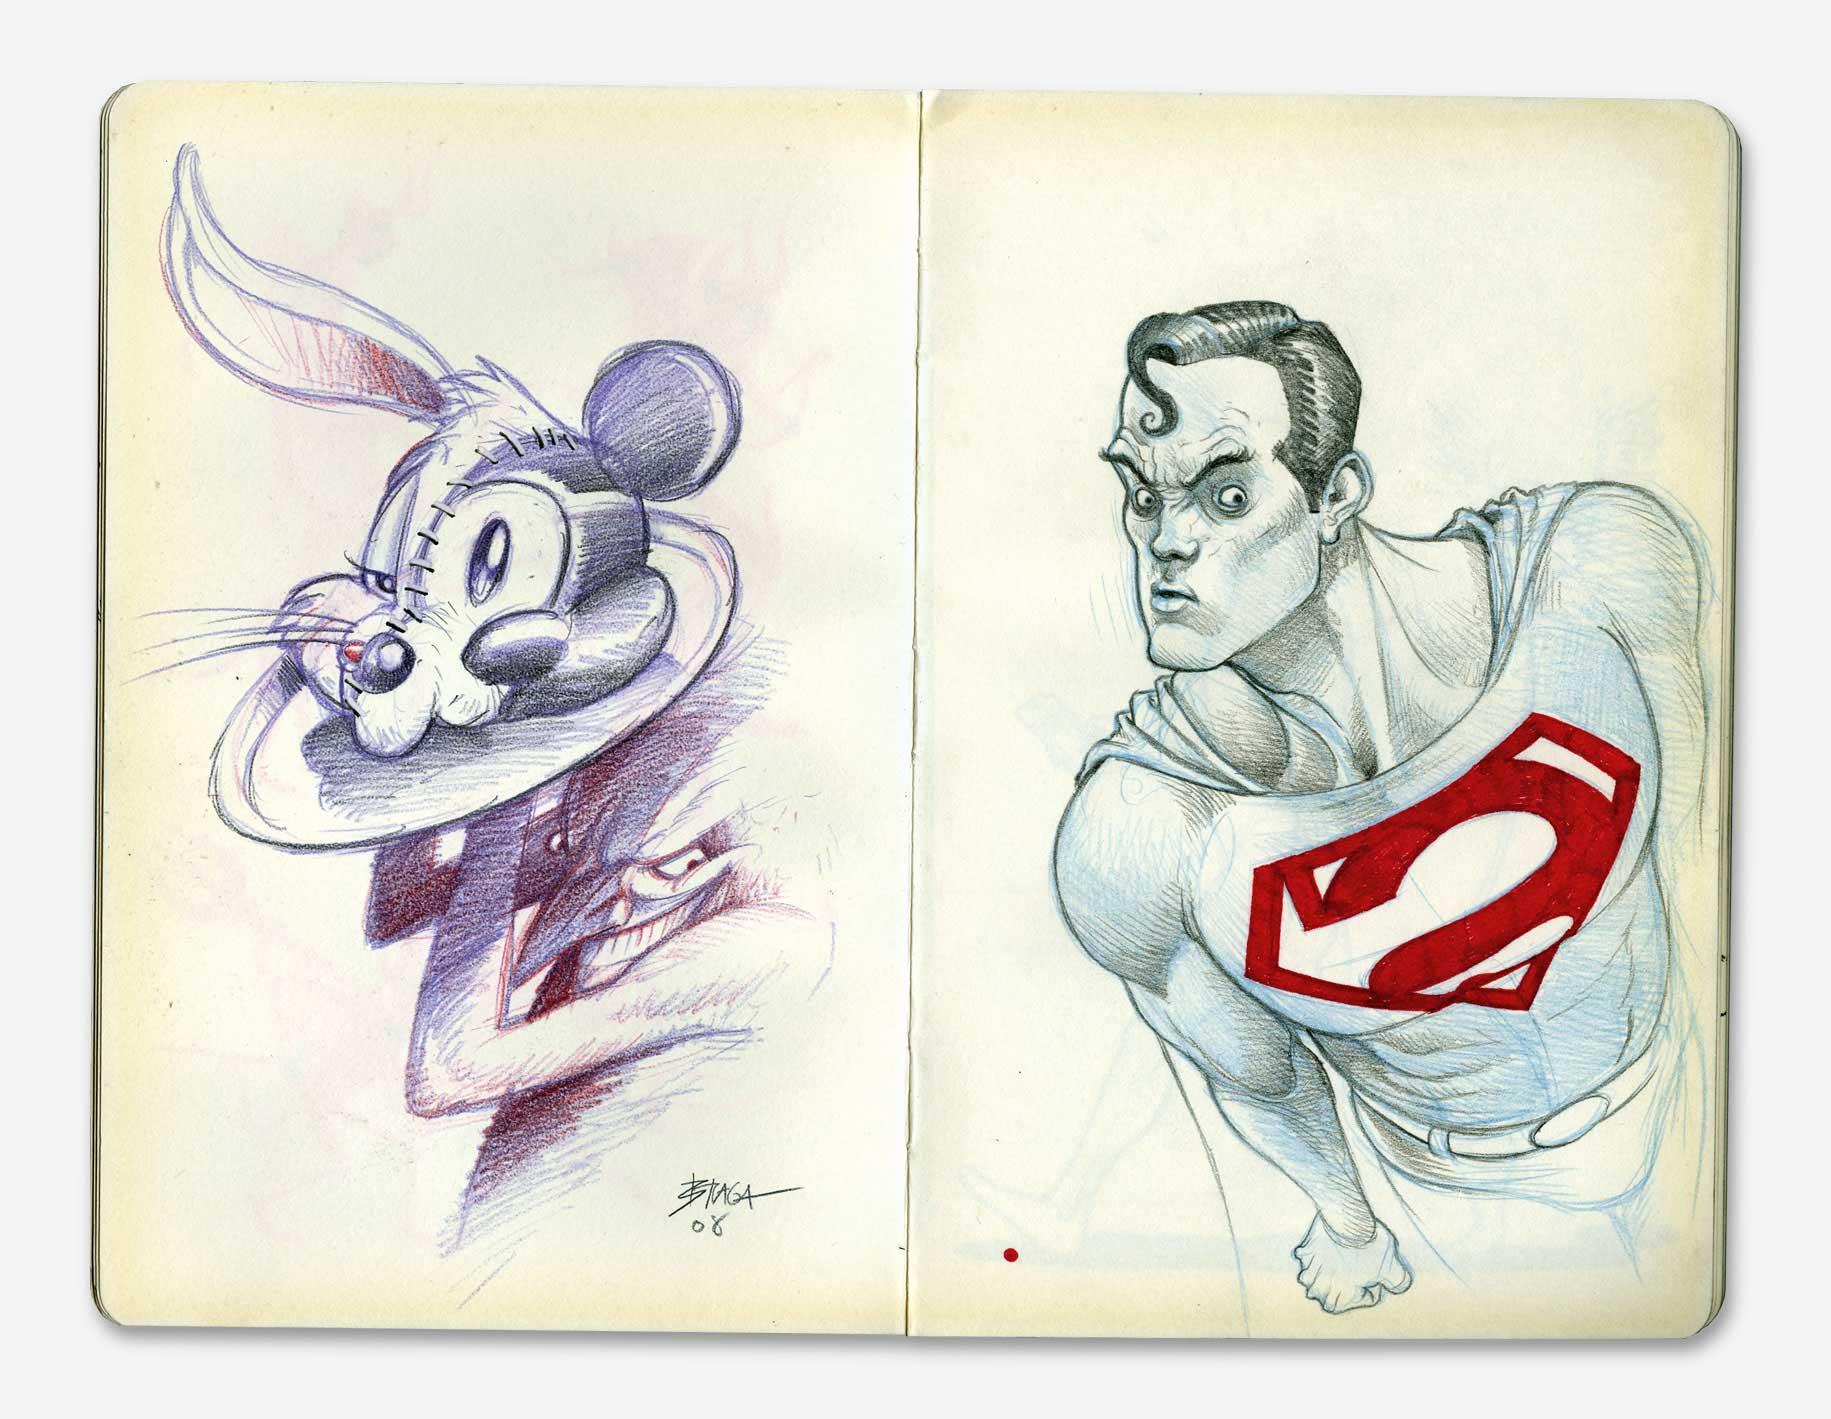 coxa-superman-bizarro-diburros-braga